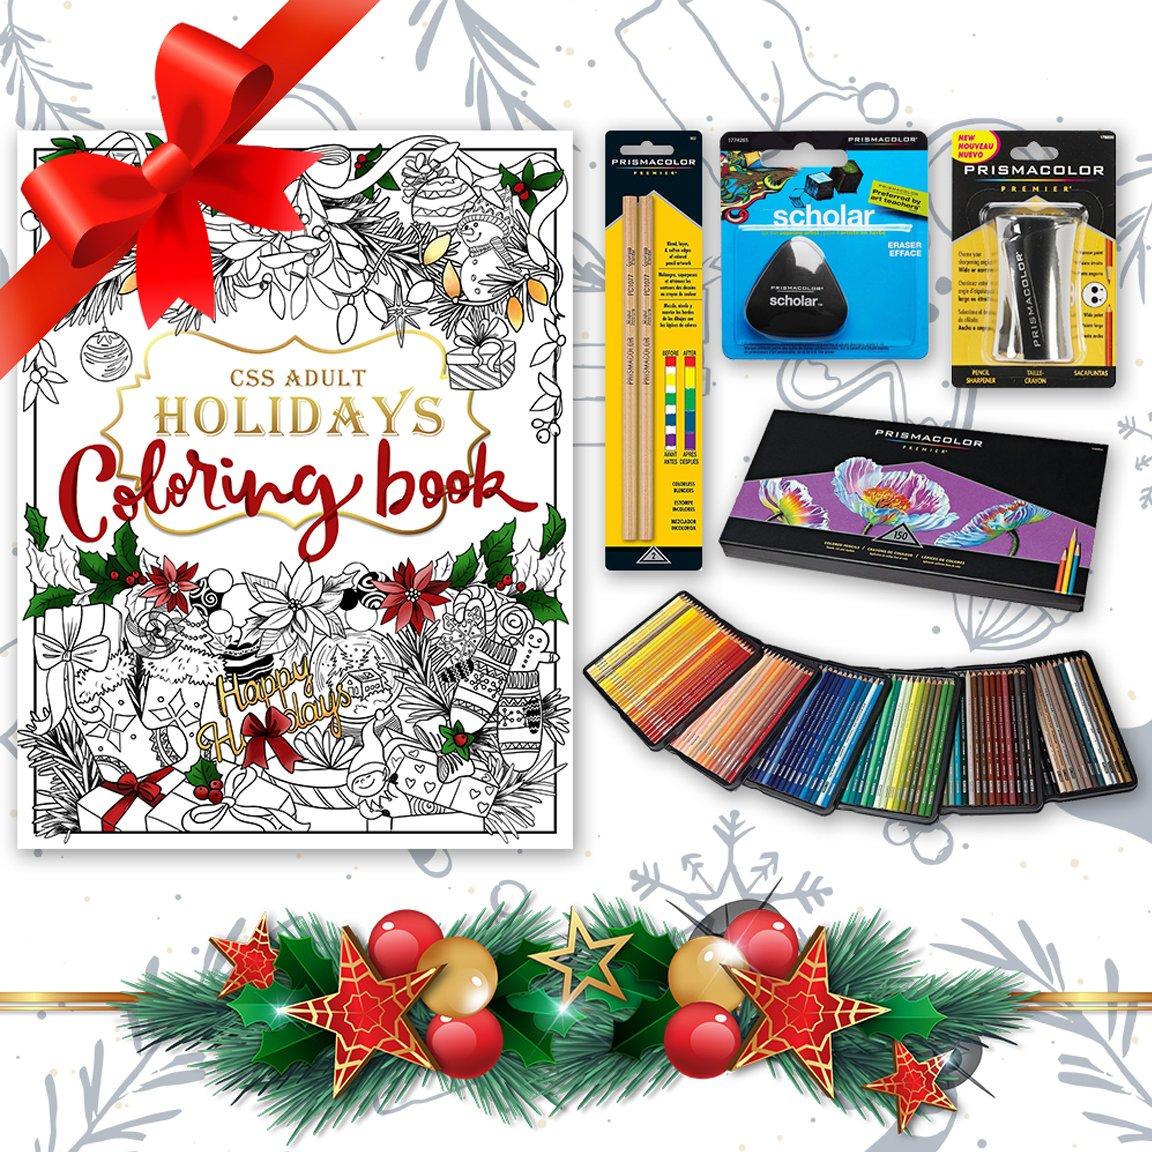 Prismacolor Bundle - 150-Count Colored Pencils, Triangular Scholar Pencil Eraser, Premier Pencil Sharpener, Colorless Blender Pencils, and CSS Adult Coloring Book by Prismacolor (Image #1)